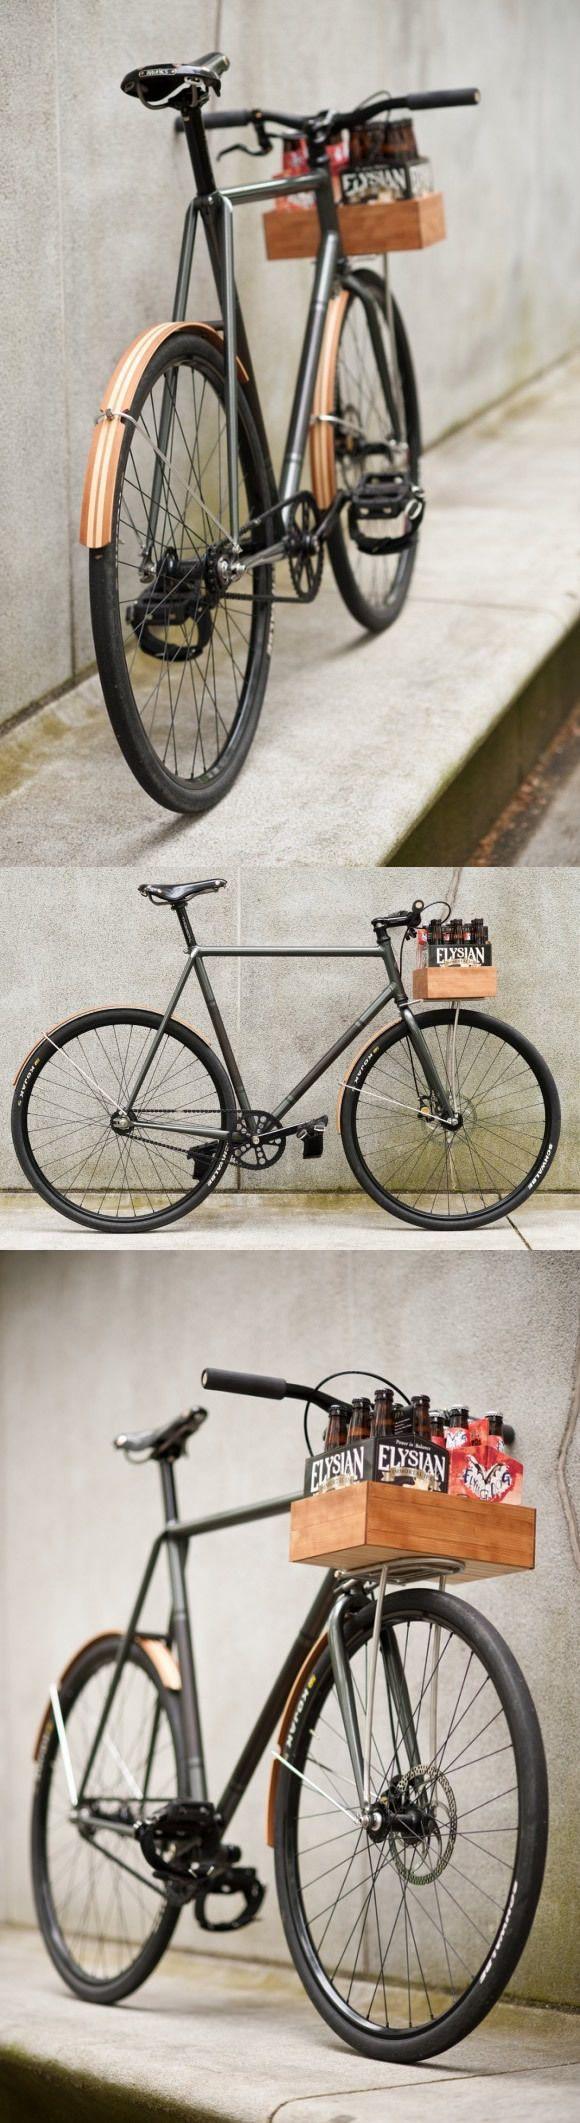 Wooden bike accessories                                                                                                                                                                                 More